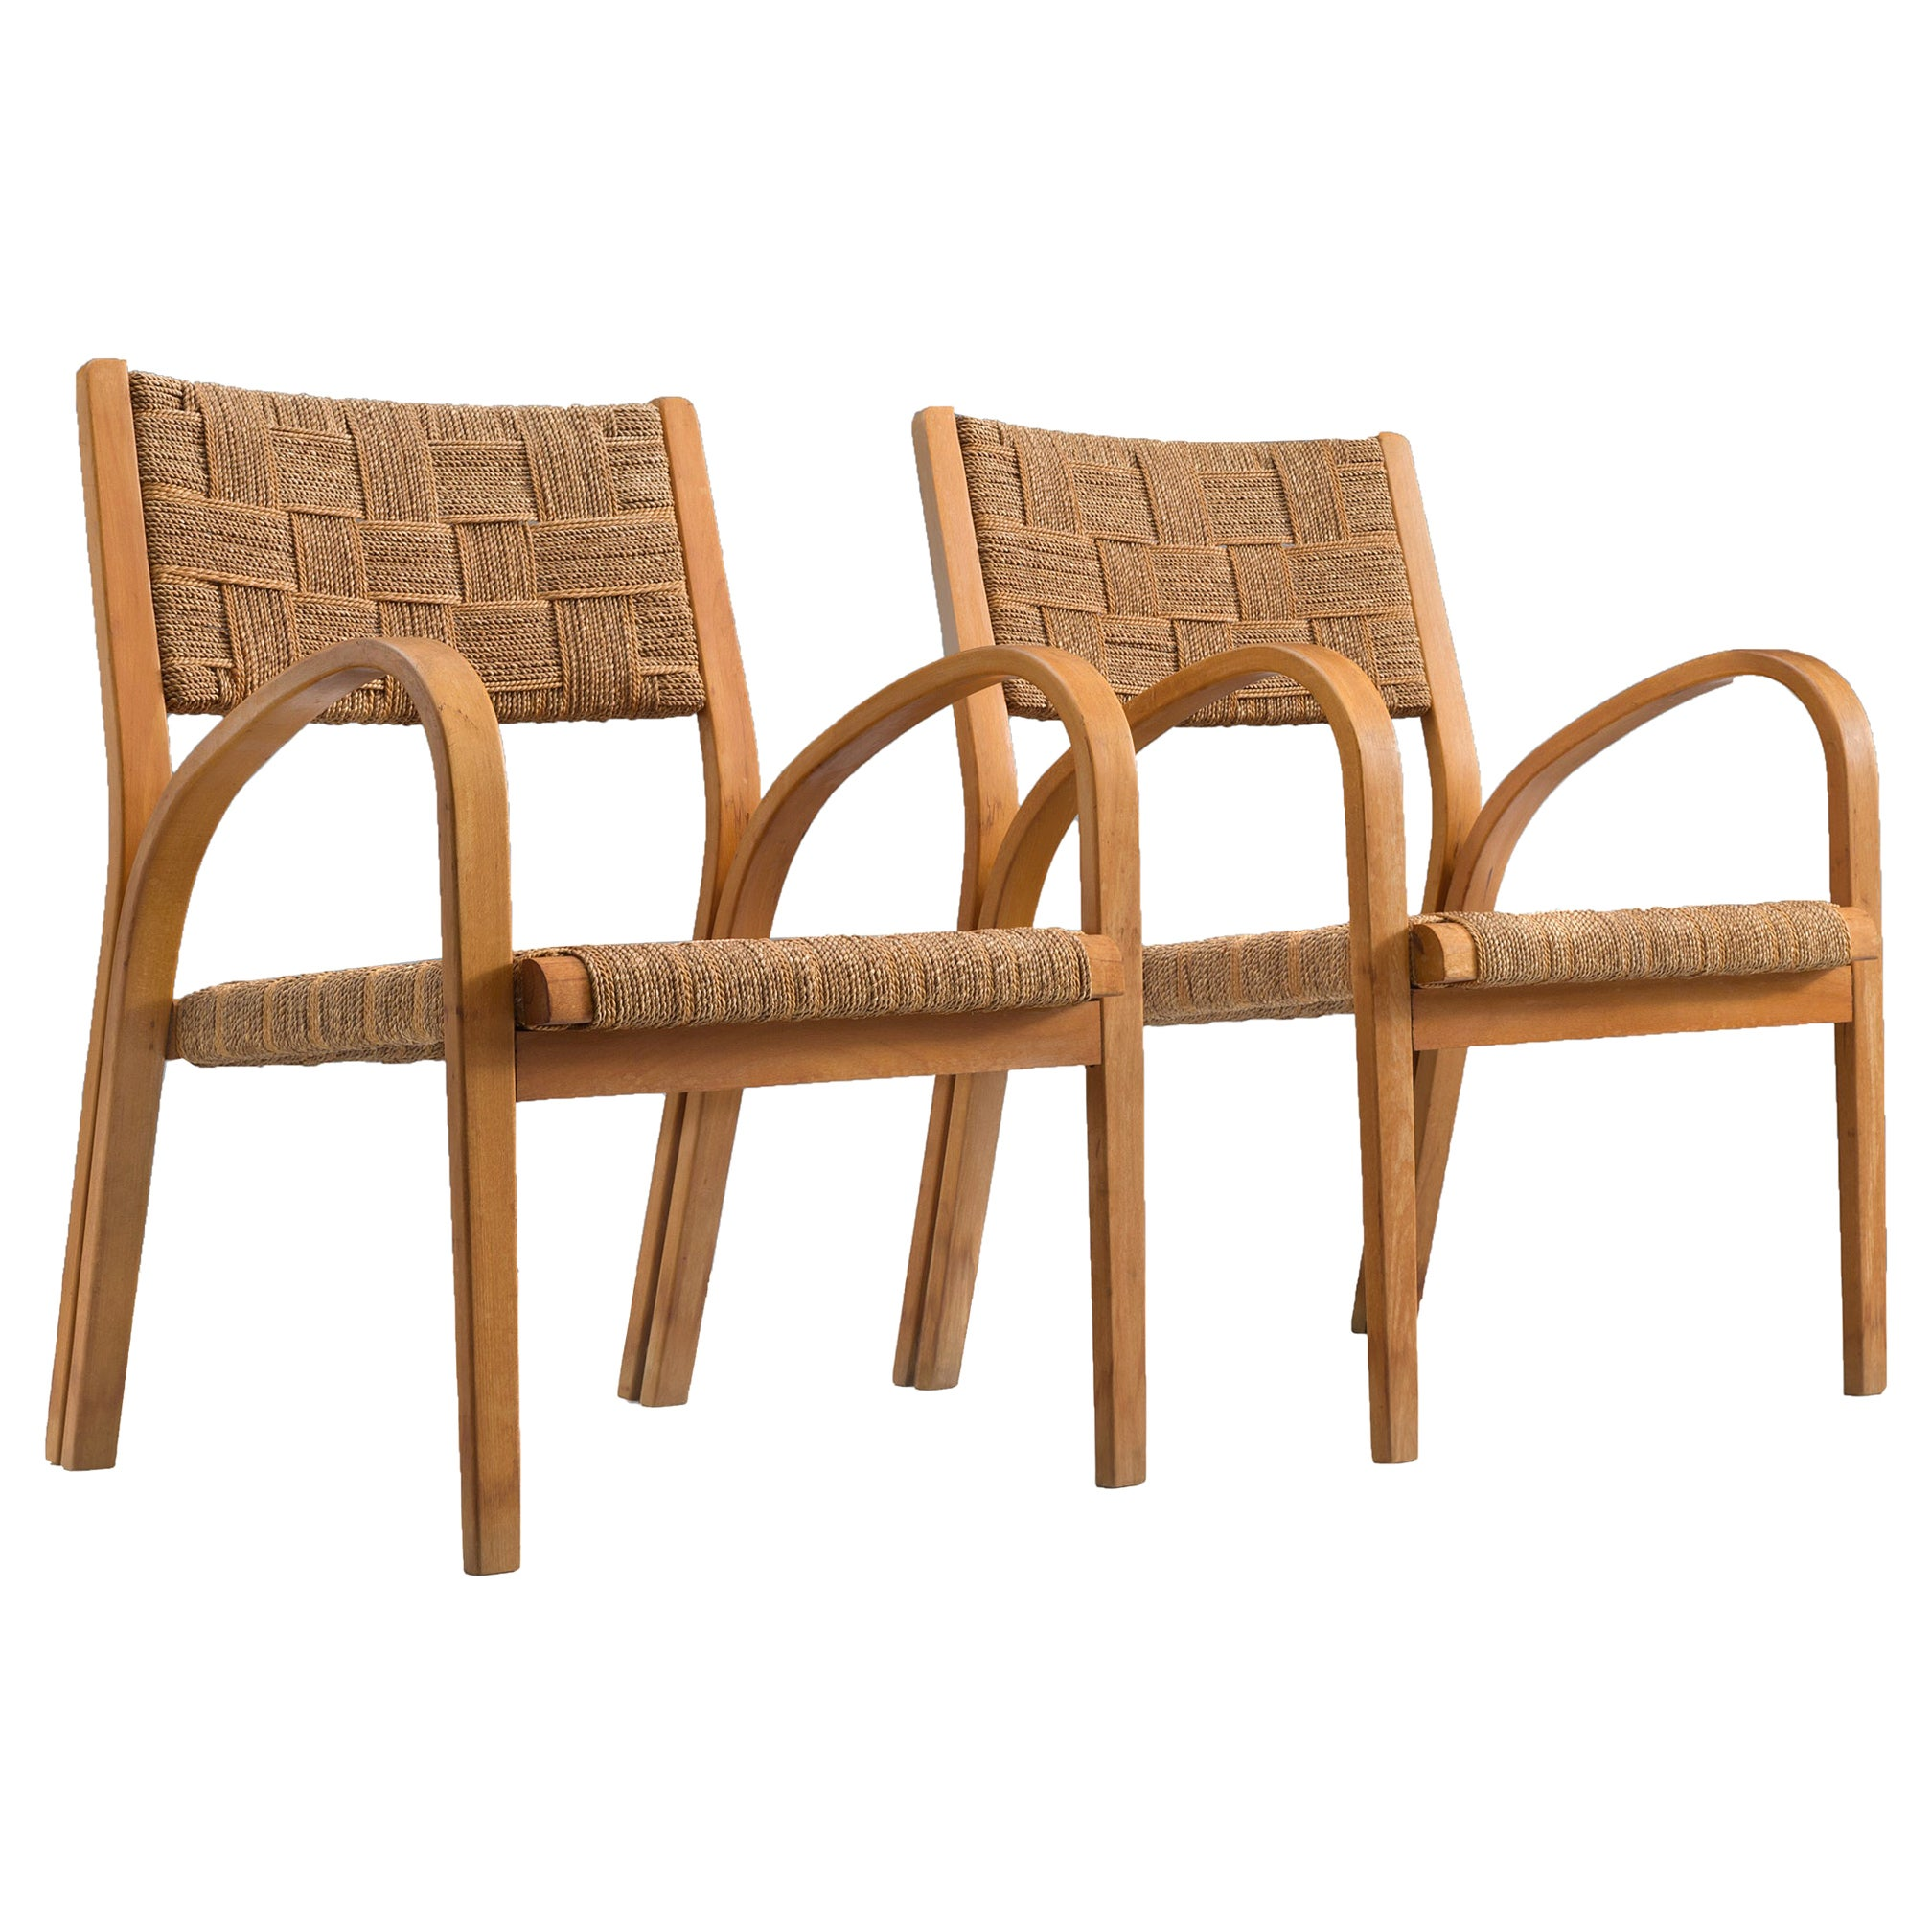 Italian Rope Lounge Chairs with Ottoman, circa 1940